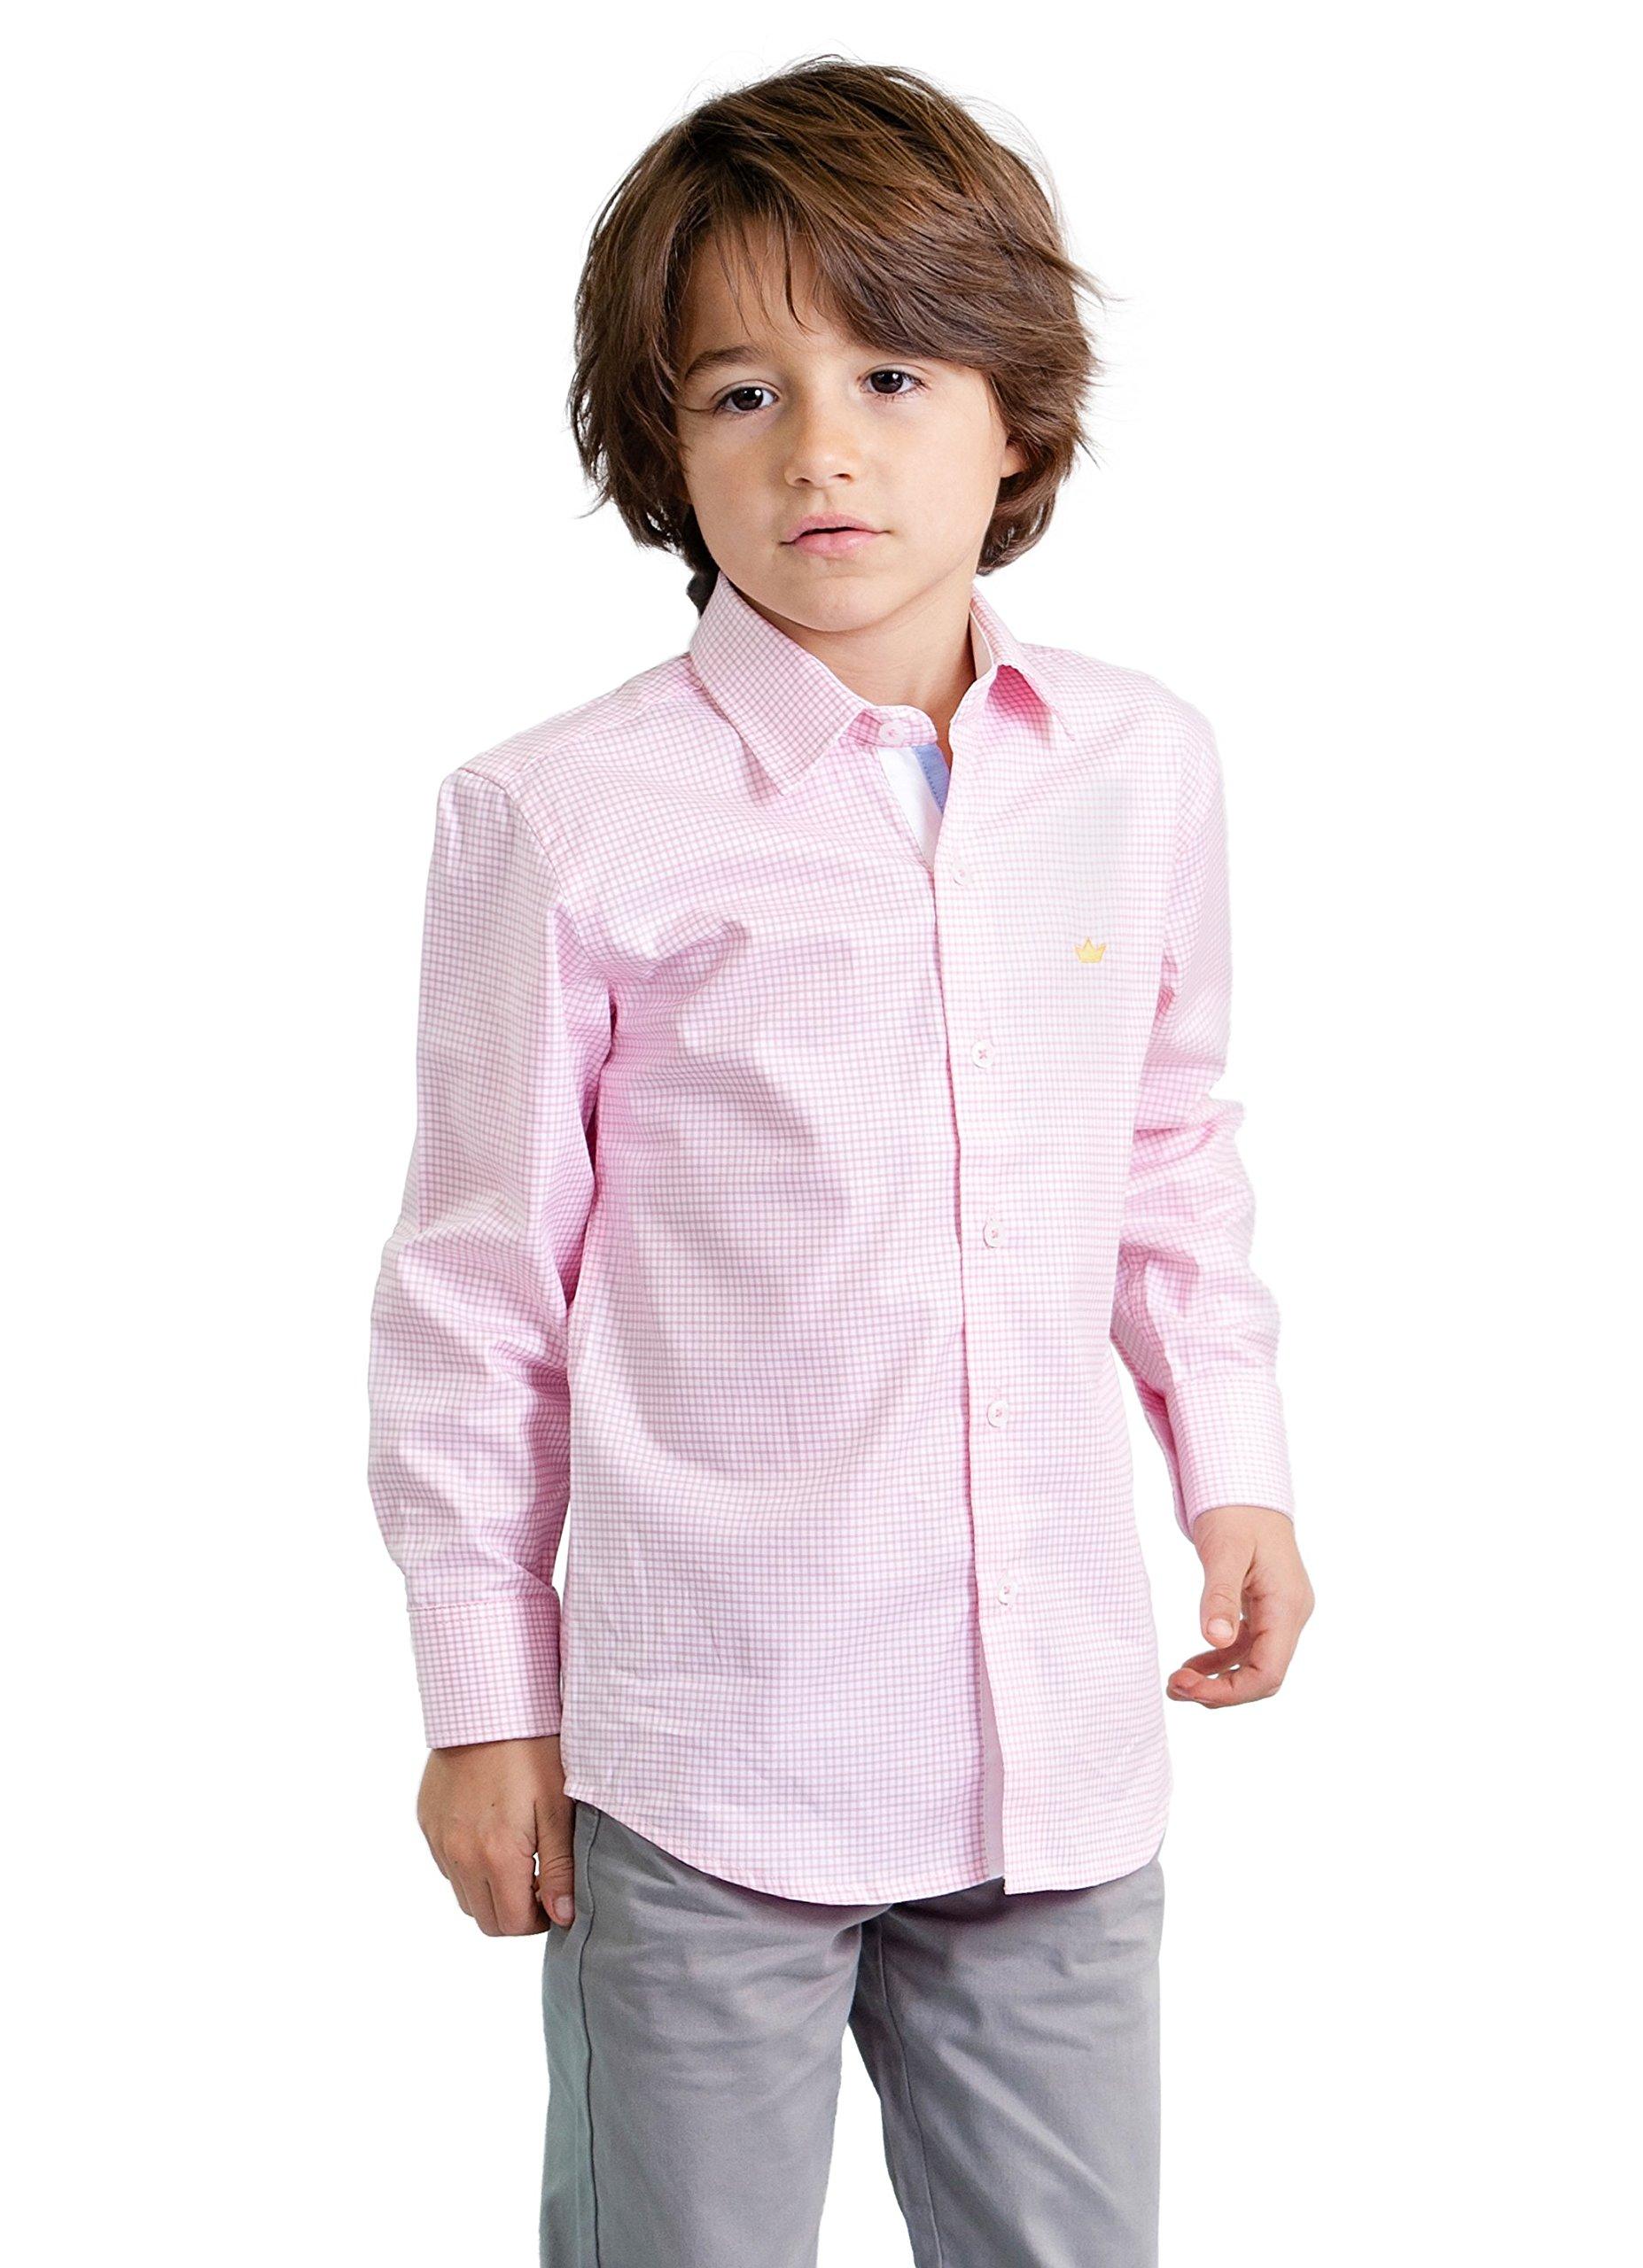 Dakomoda Toddler Boys' Pink Check Pima Cotton Gingham Shirt, Easter Dress Shirt 4T